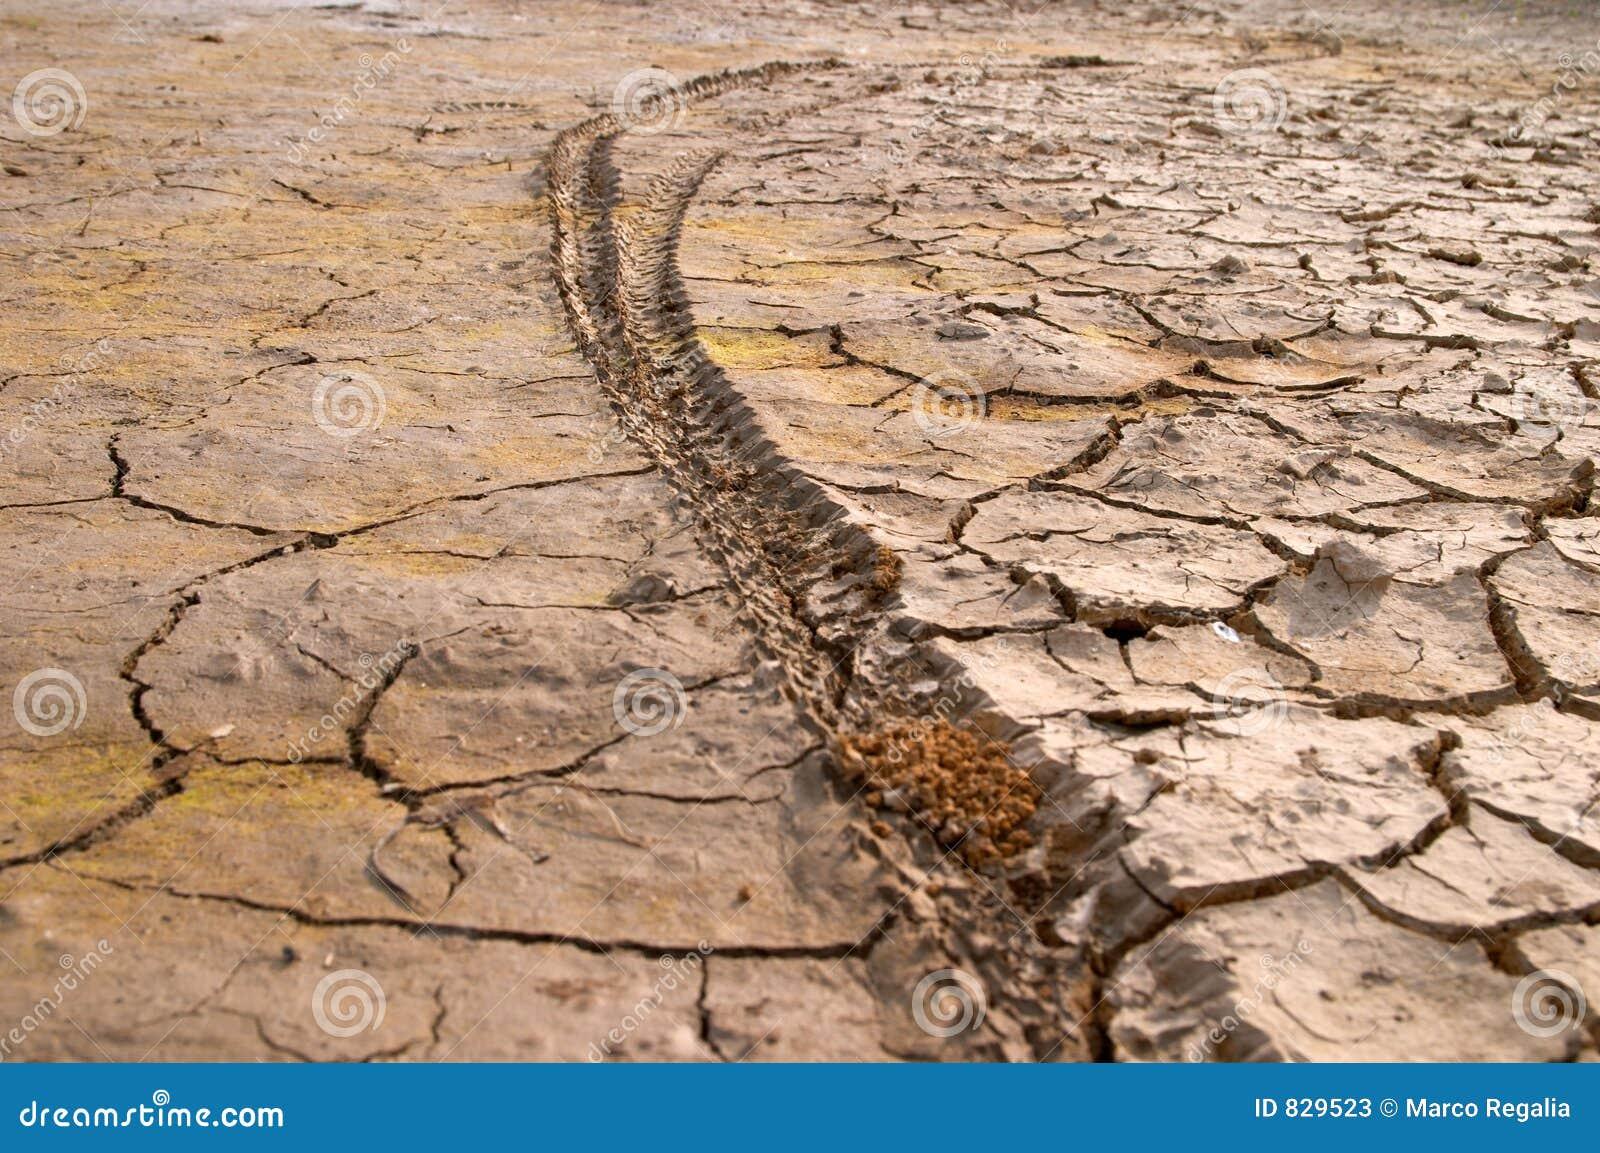 Bike tire print on dry mud cracks